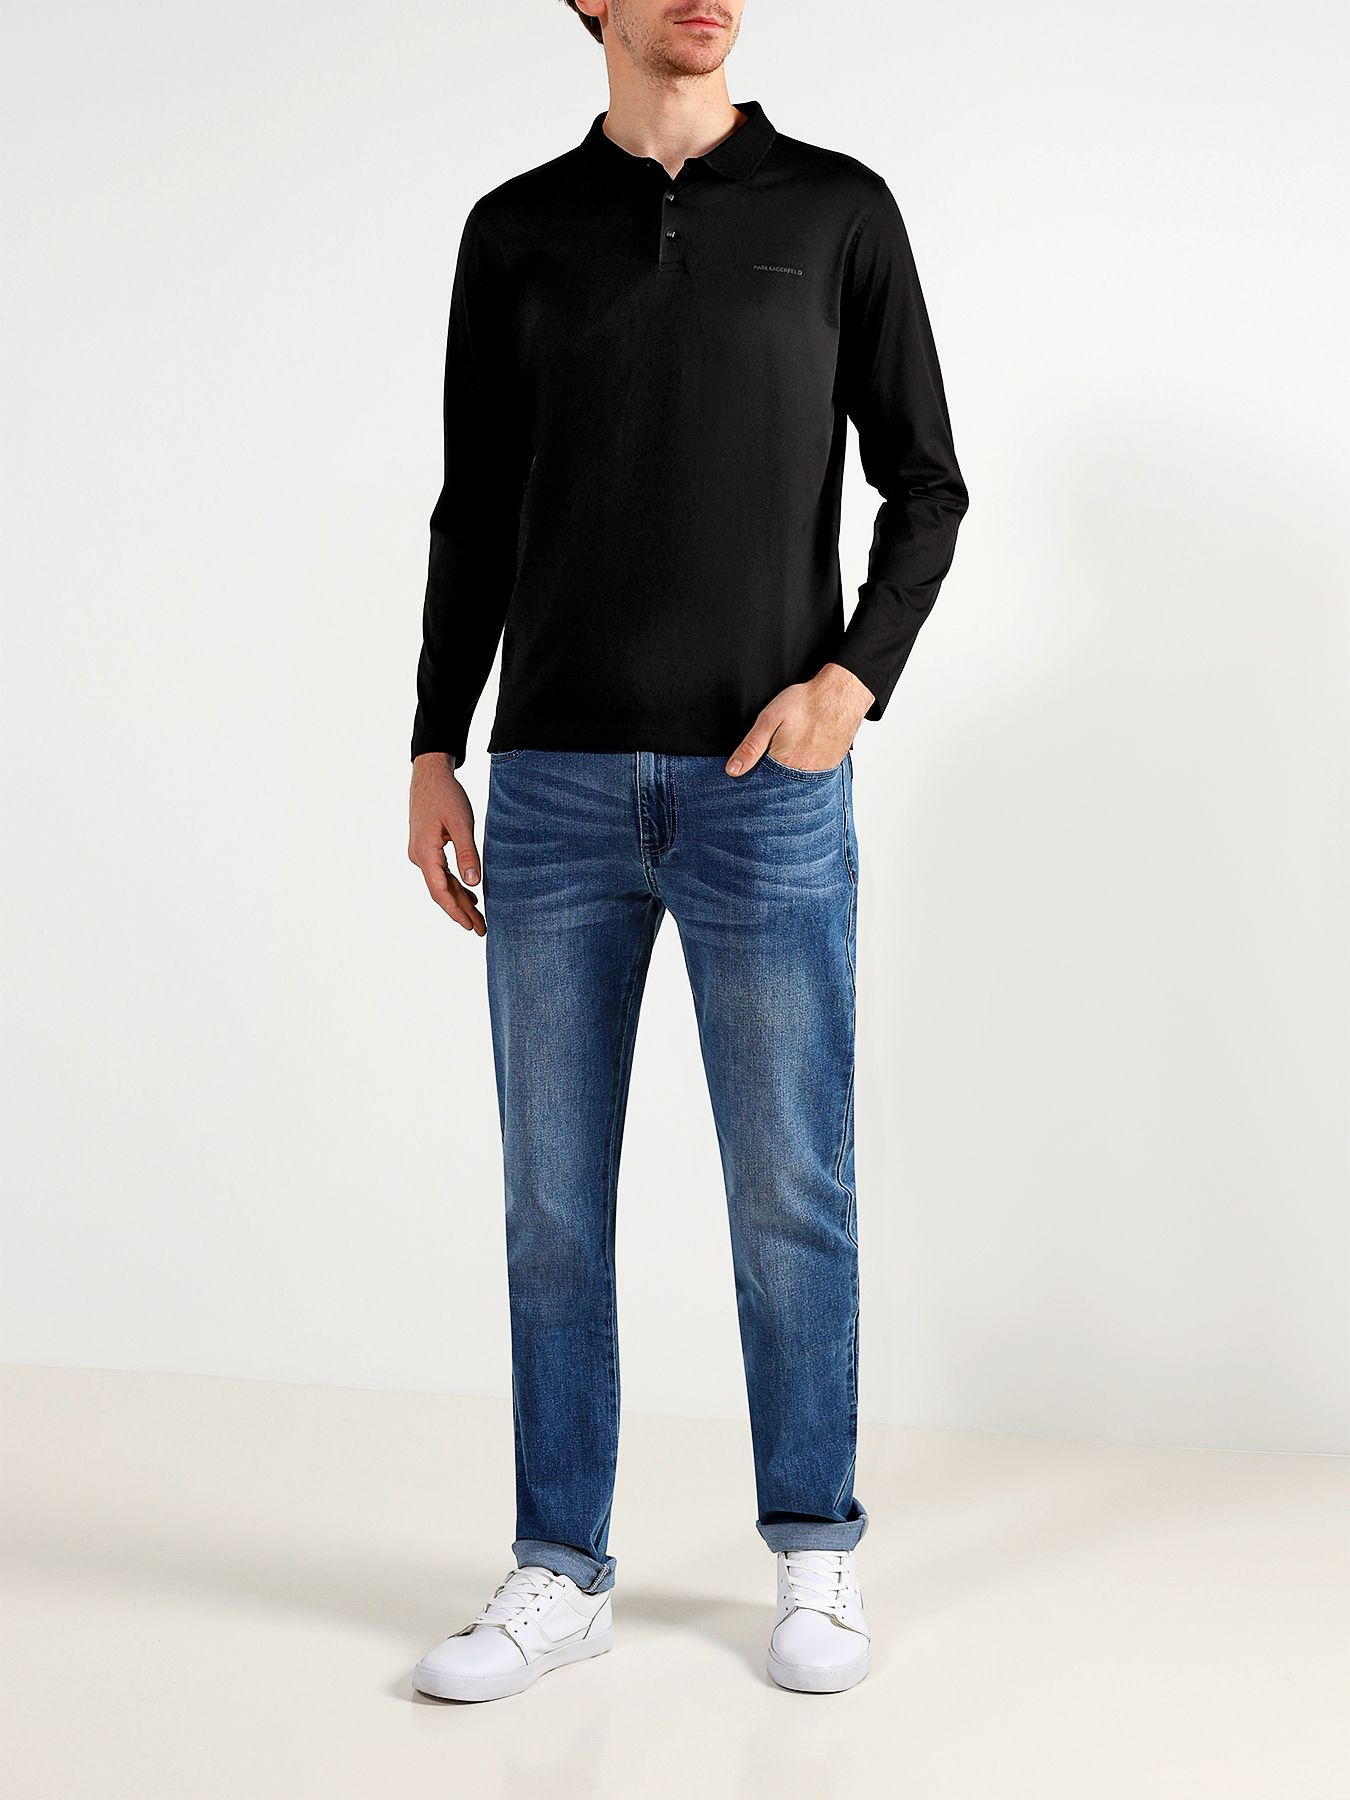 Рубашка с воротом поло Karl Lagerfeld Поло с длинным рукавом